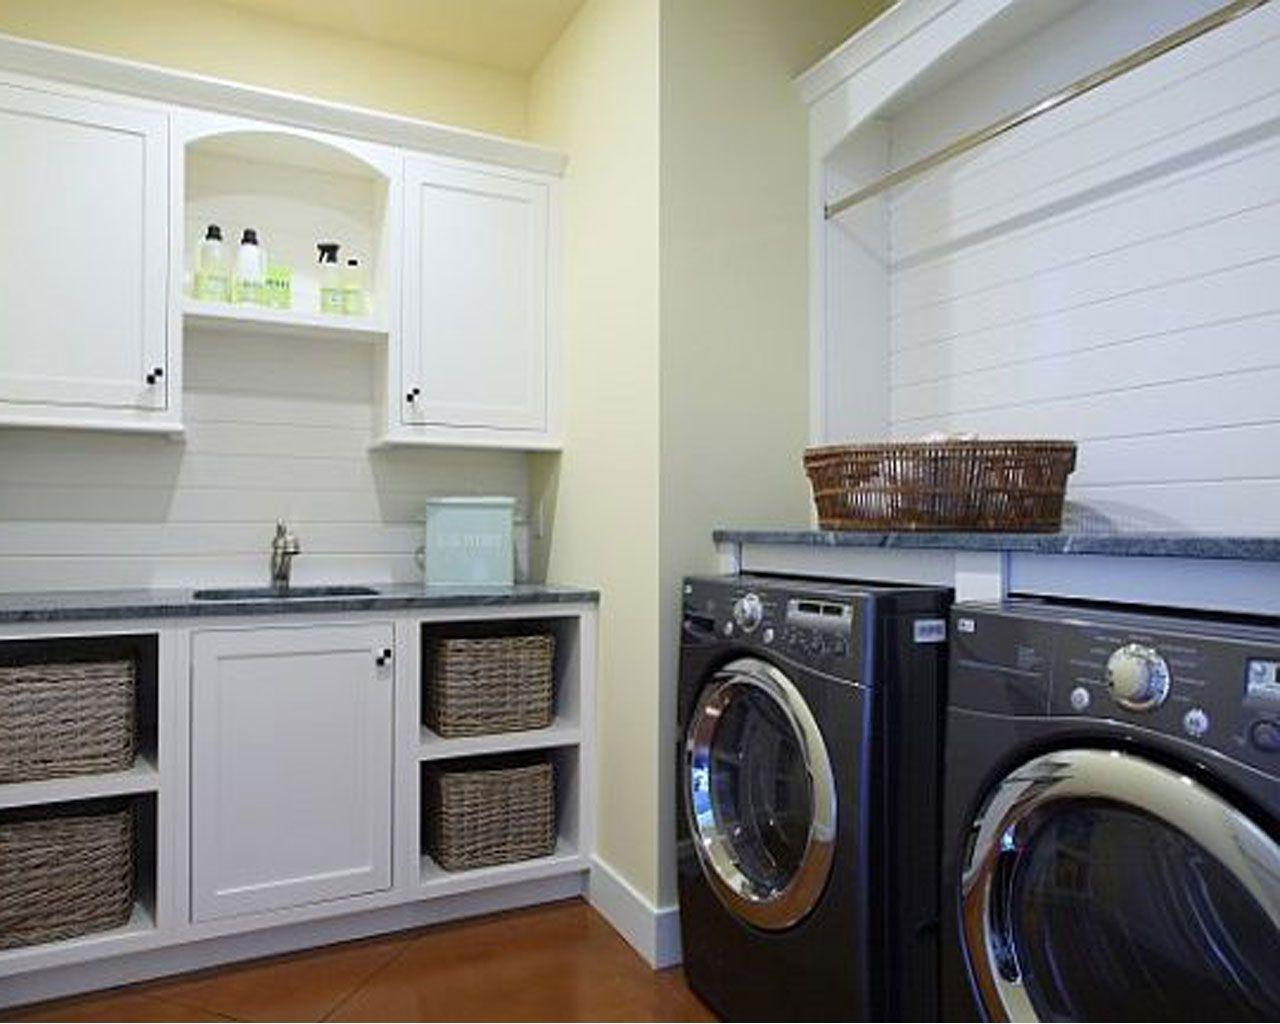 Tiny Laundry Room Decorating Ideas Small Utility Room Design Ideas Laundry Room Designs To Inspire Modern Laundry Rooms